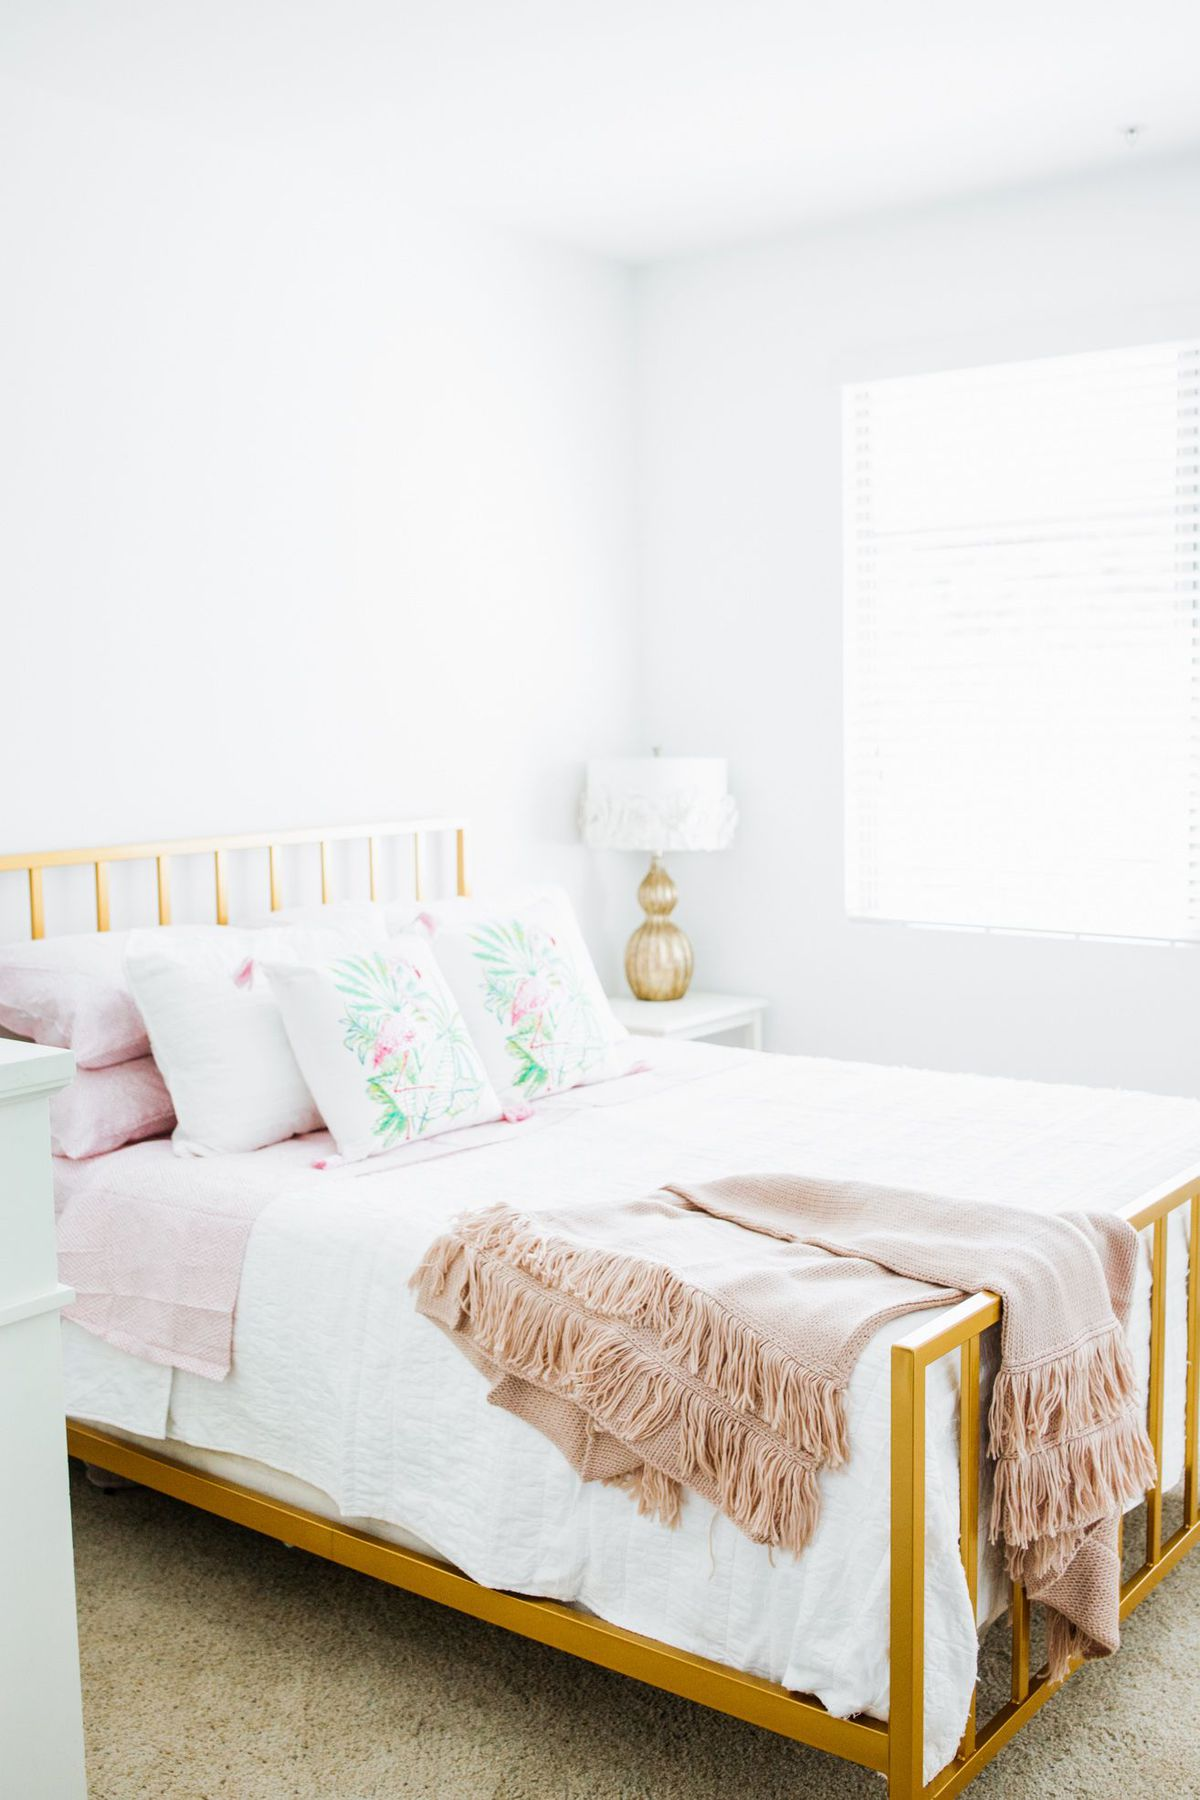 macys new best of vine bedding size bradley queen foam bed vera frame mattress dine dimensions pact memory bunk topper king